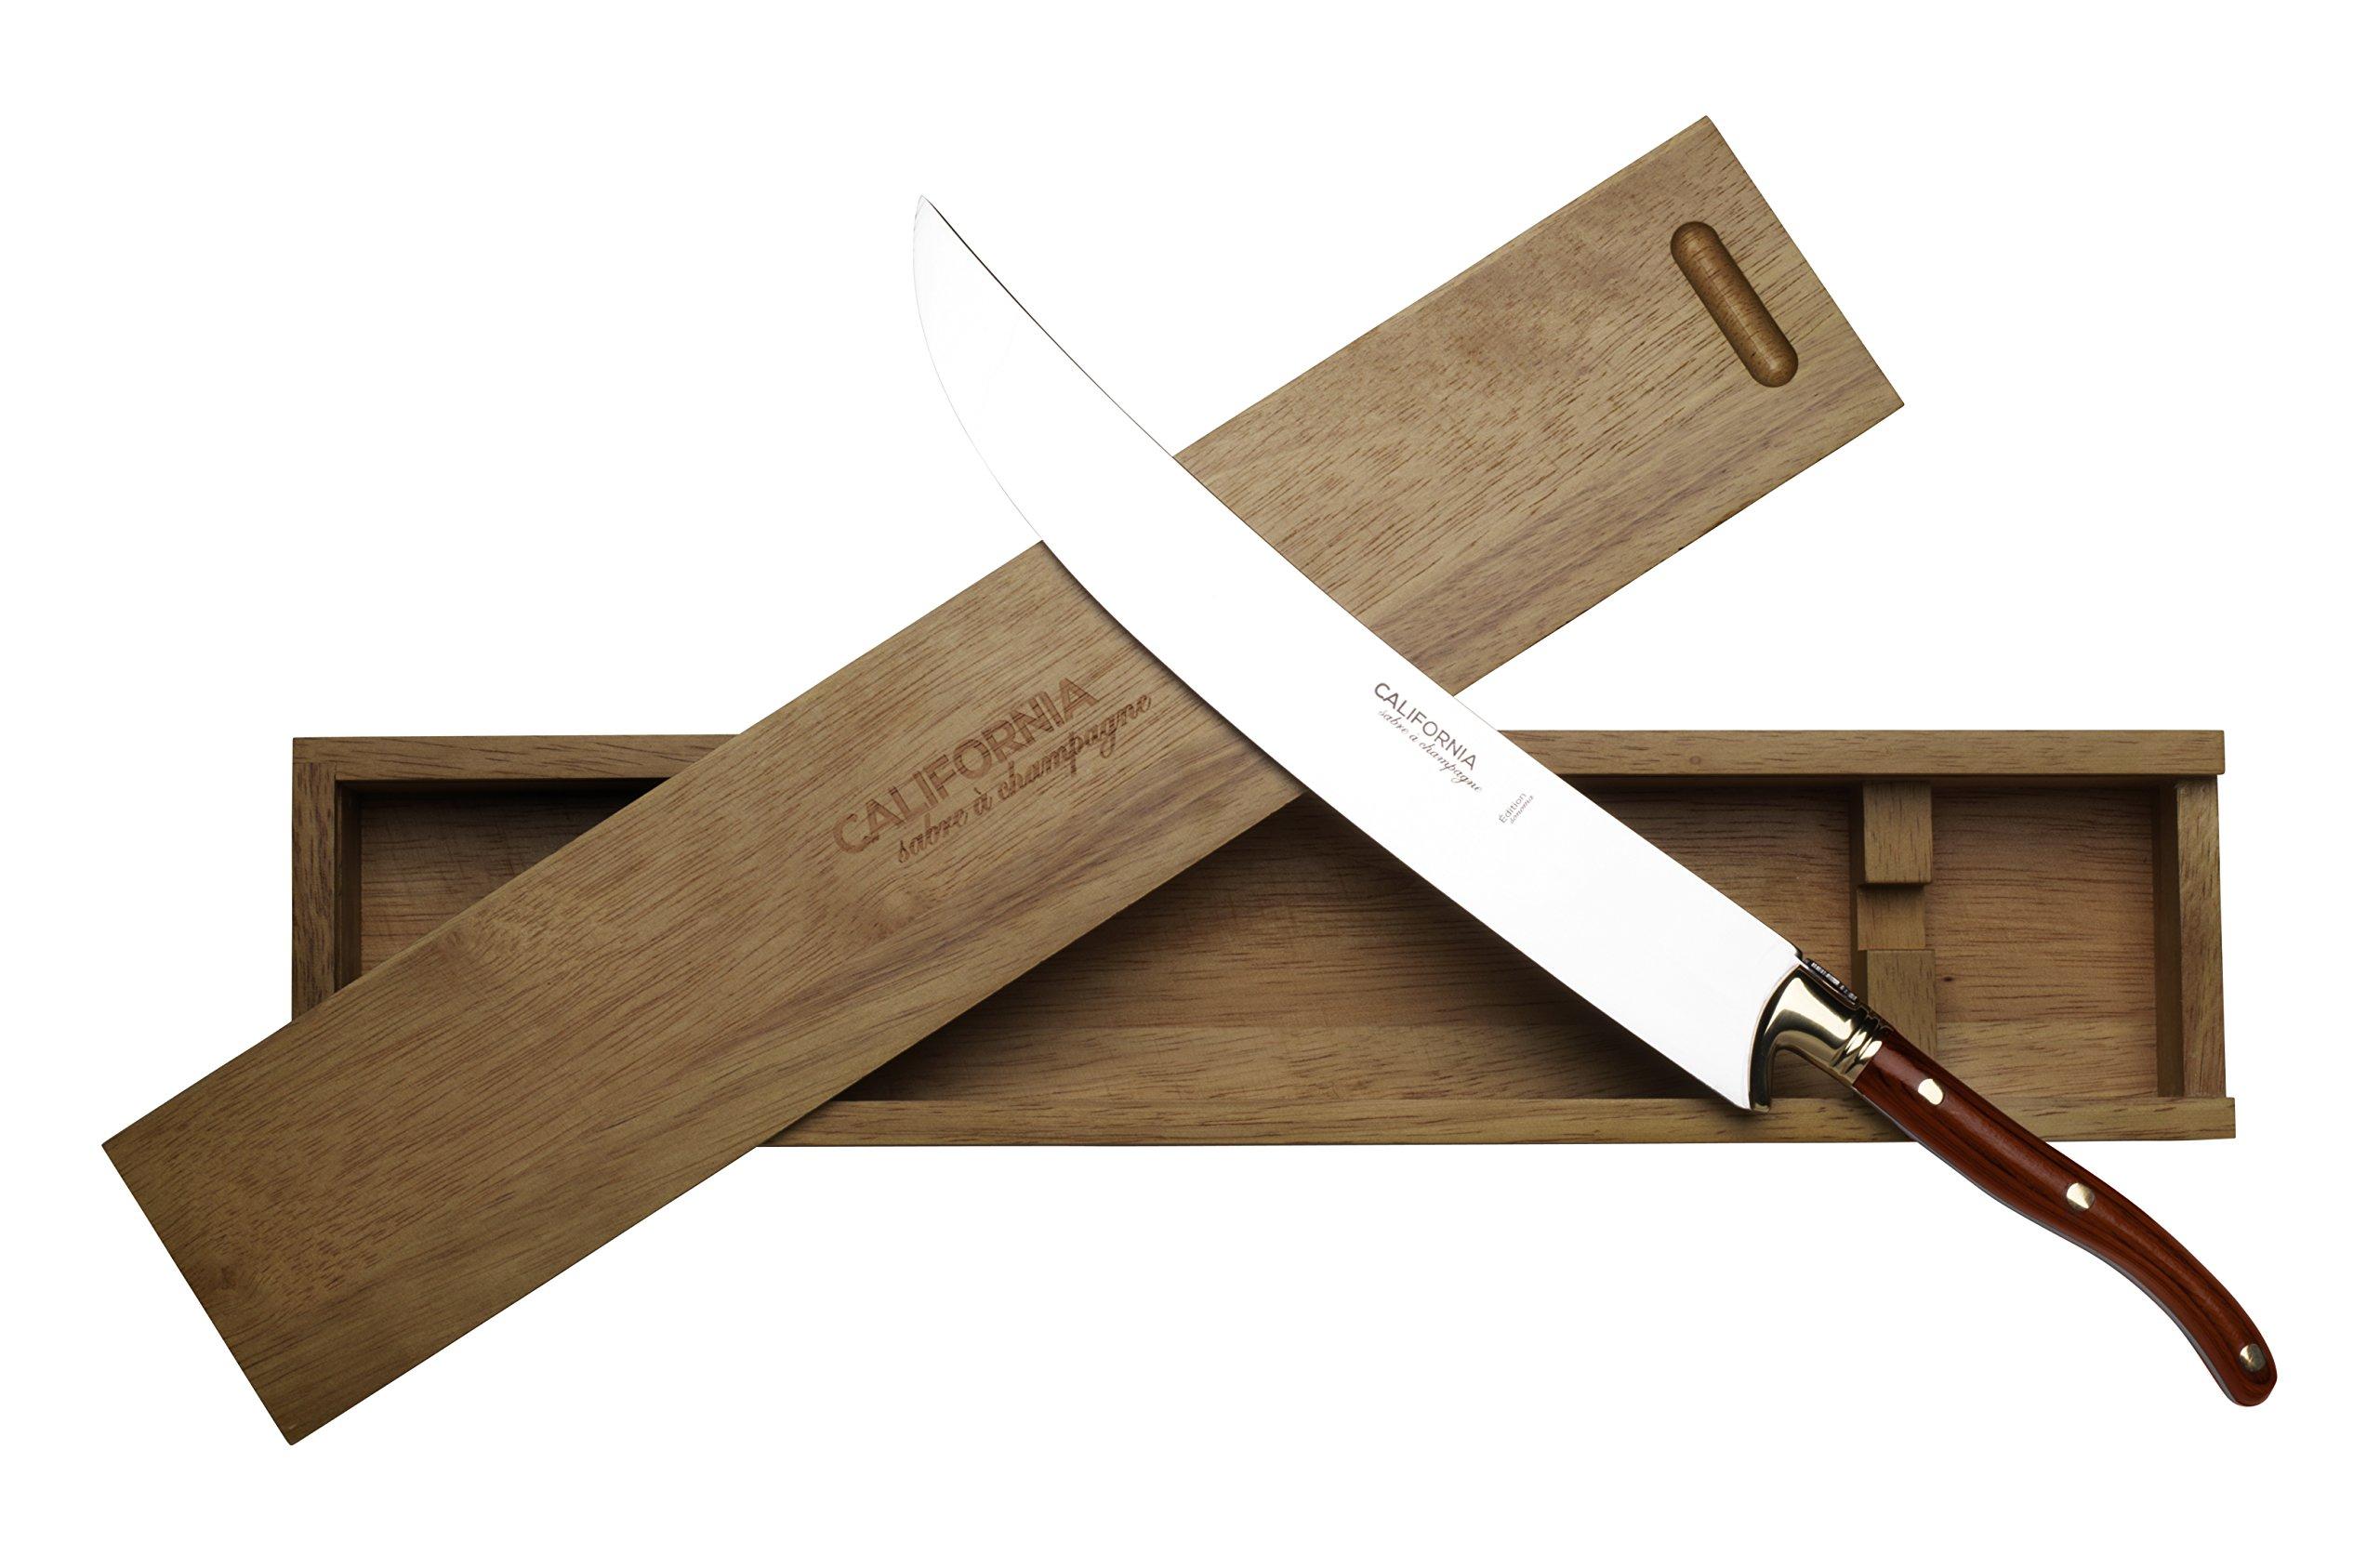 California Champagne Saber Company Sabrage Sword Edition Sonoma (Rosewood)